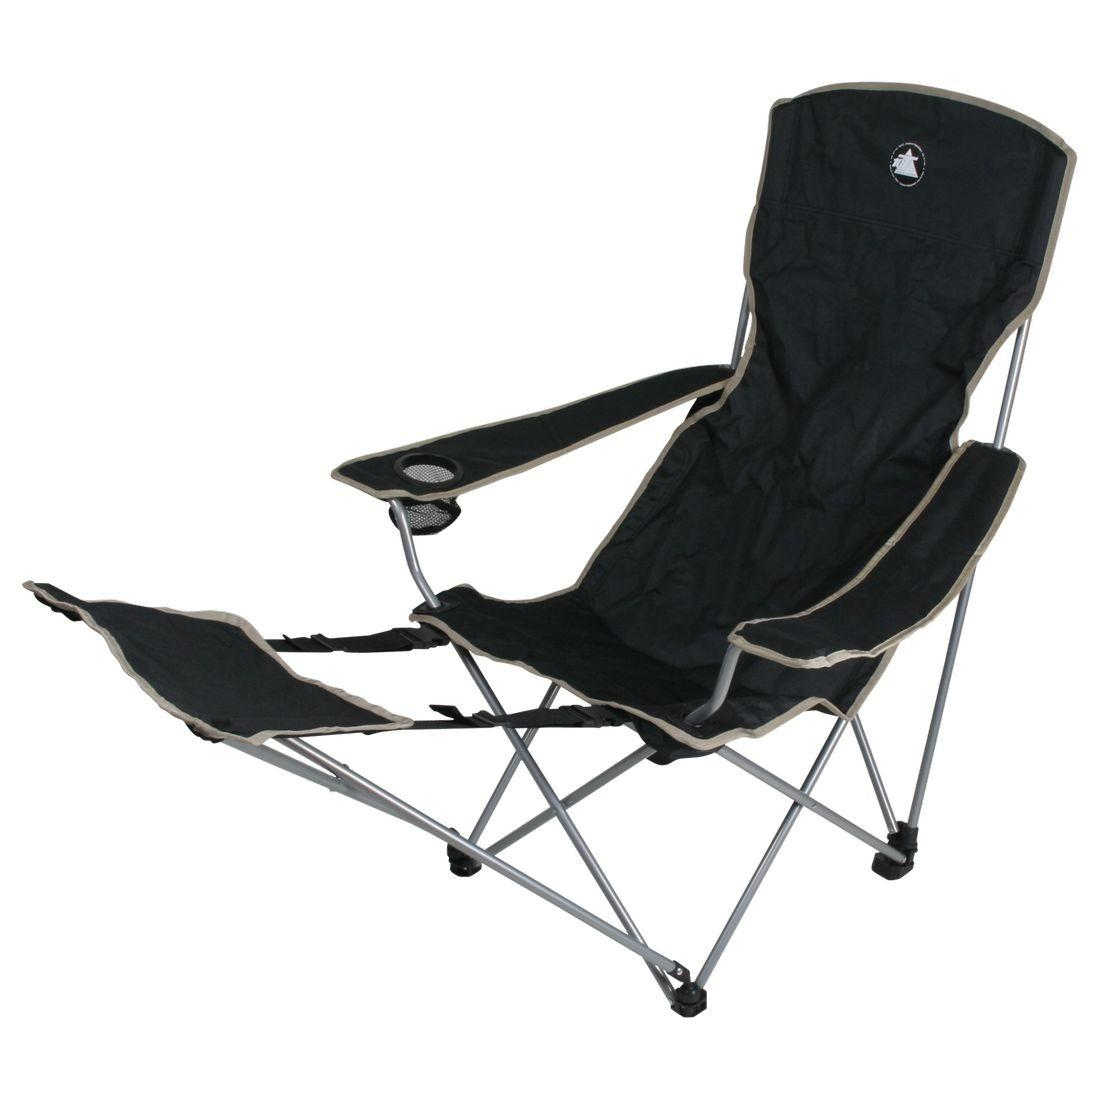 10t quickfold plus xxl campingstuhl mit fu ablage klappstuhl mit getr nkehalter faltbarer. Black Bedroom Furniture Sets. Home Design Ideas